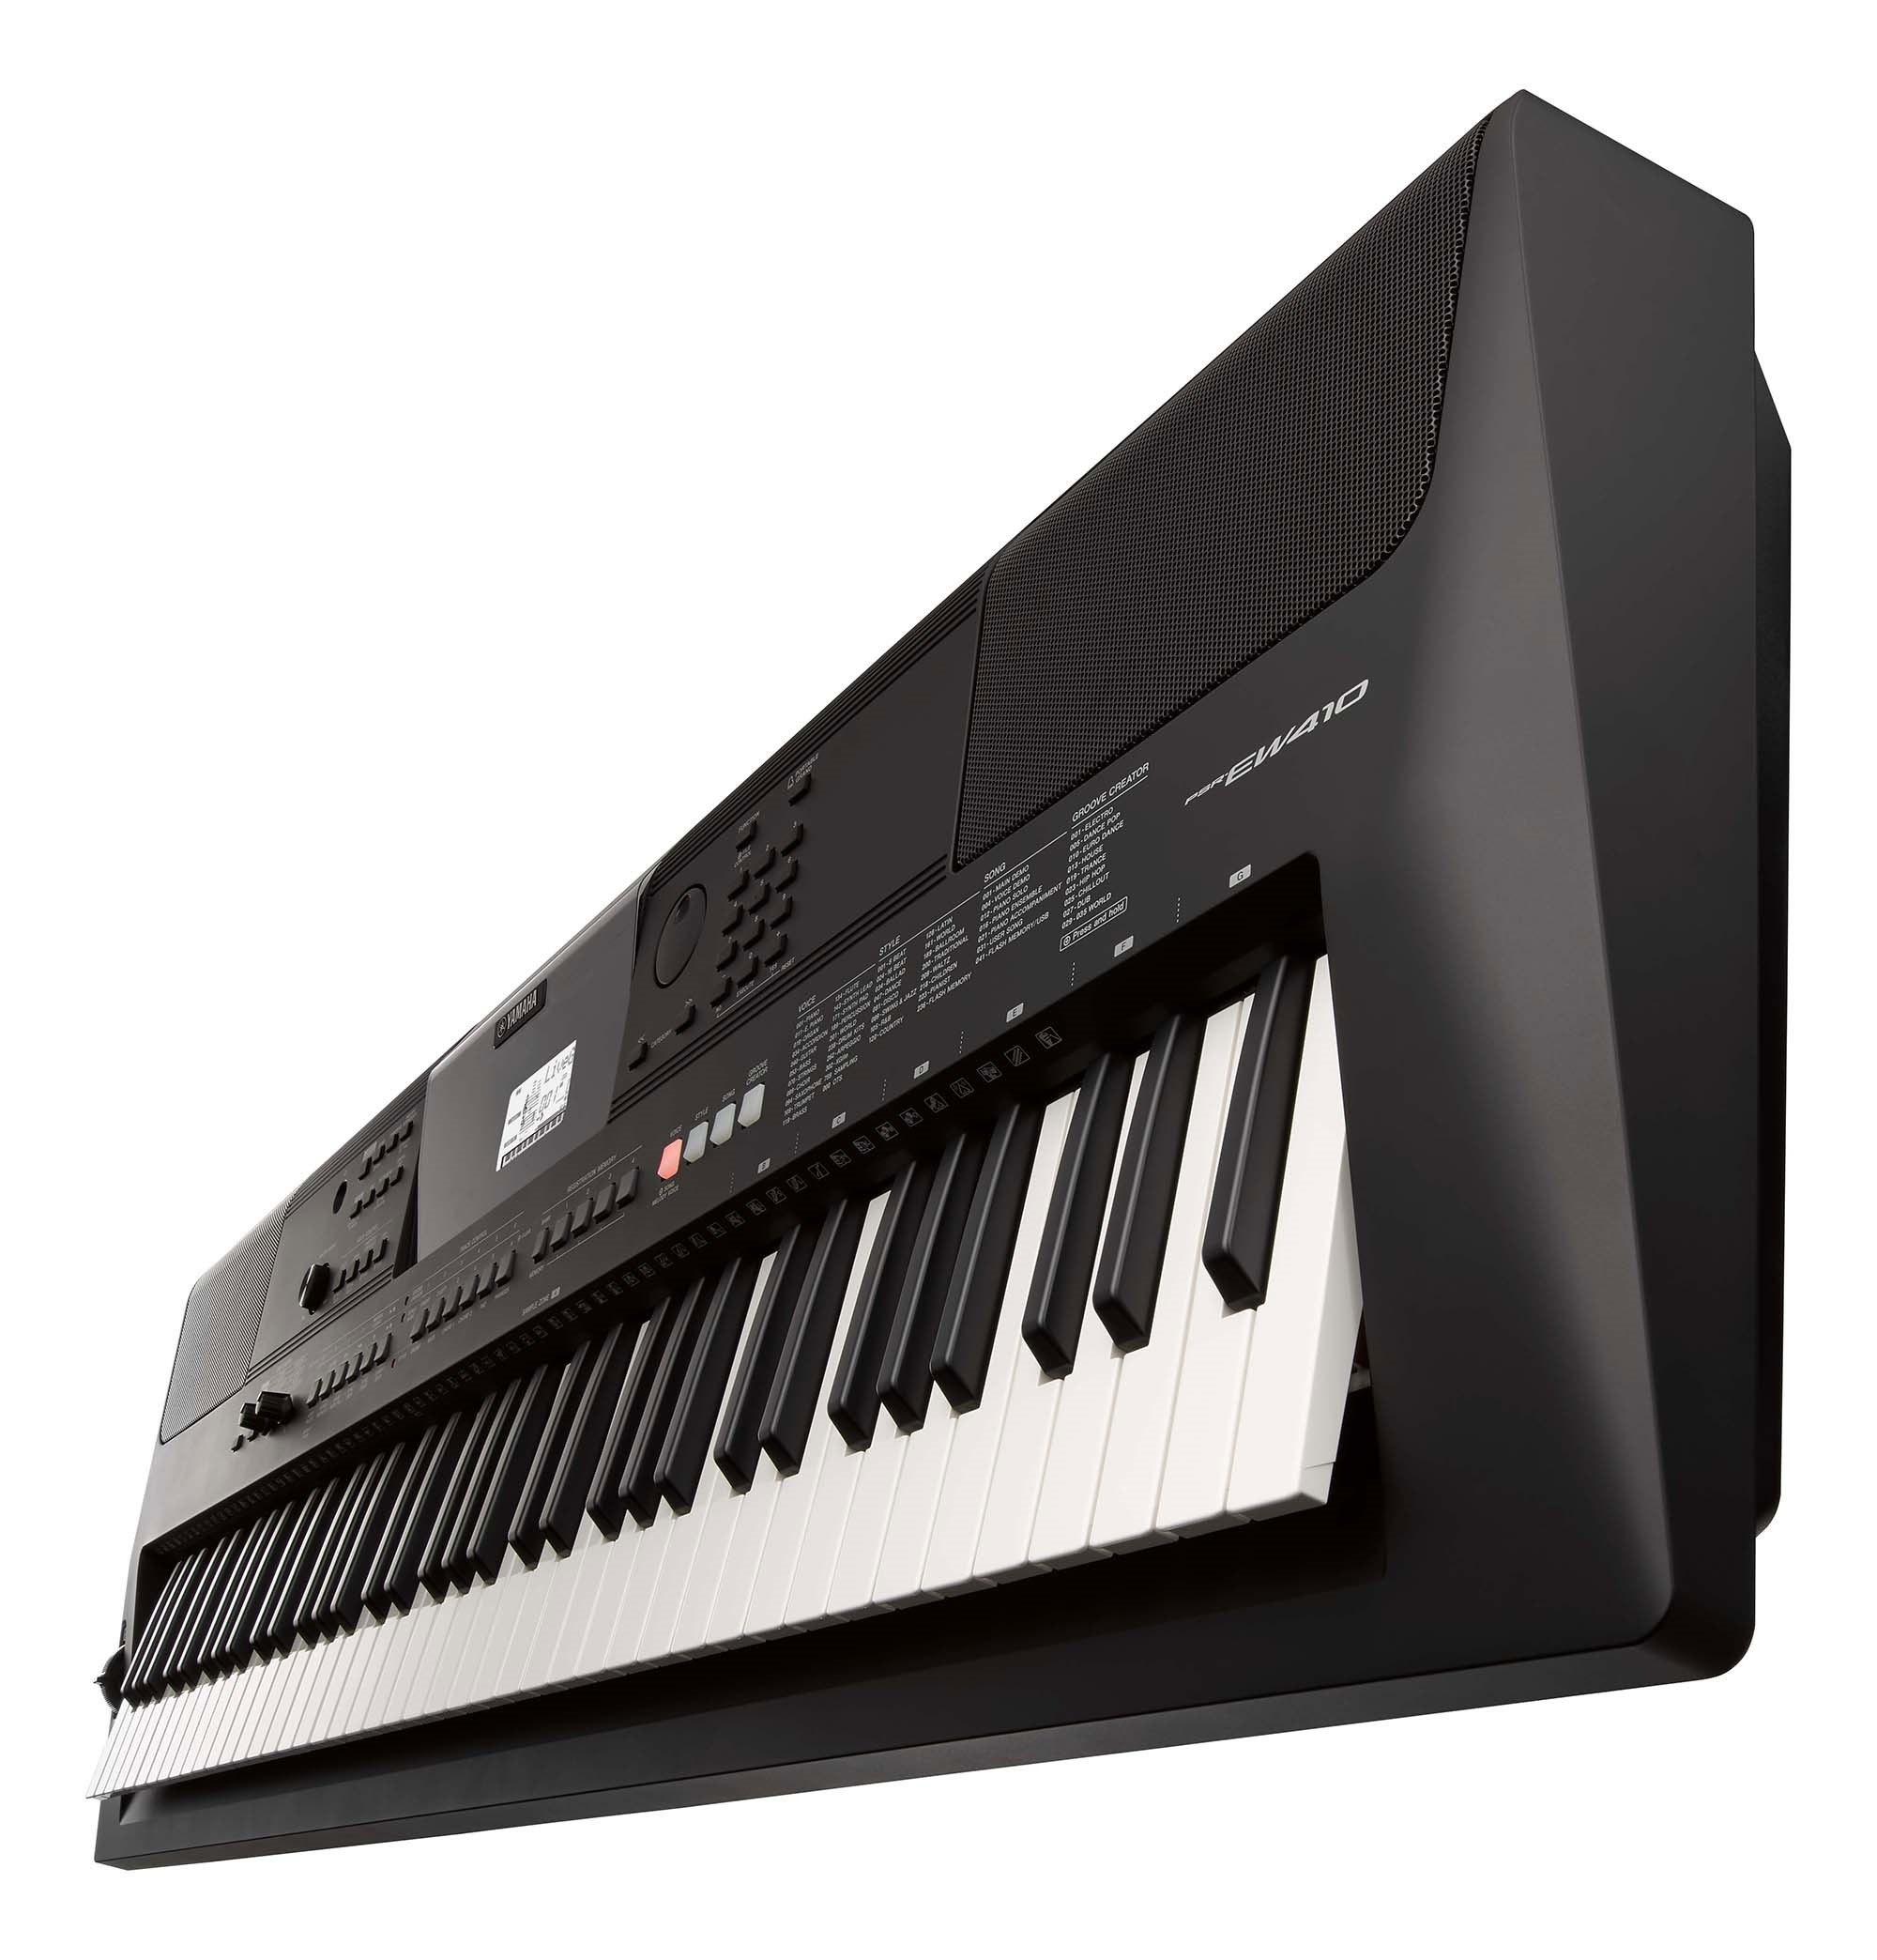 PSR-EW410 - Downloads - Portable Keyboards - Keyboard